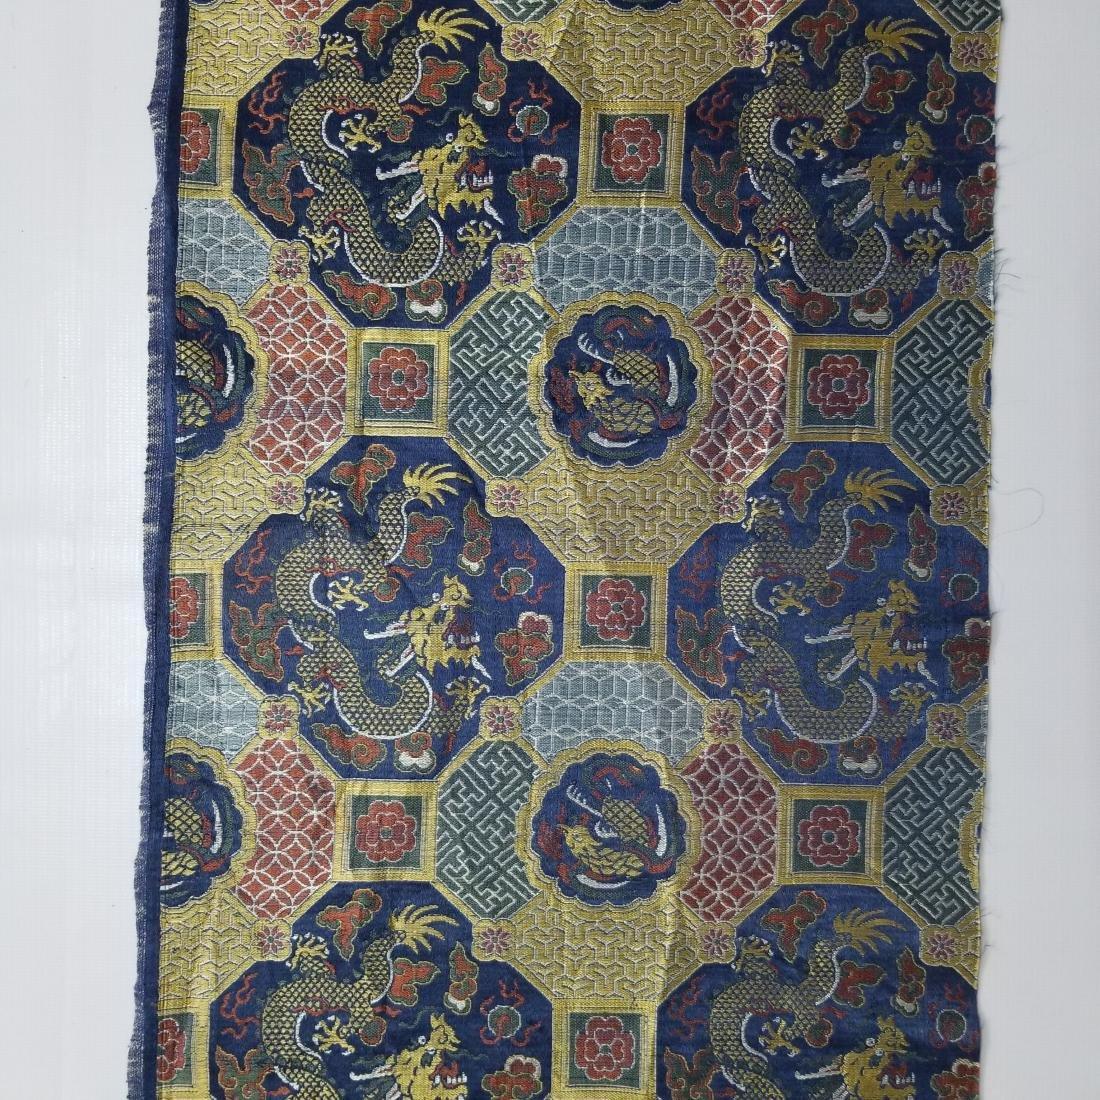 Chinese Silk Brocade Dragon Panel - 4